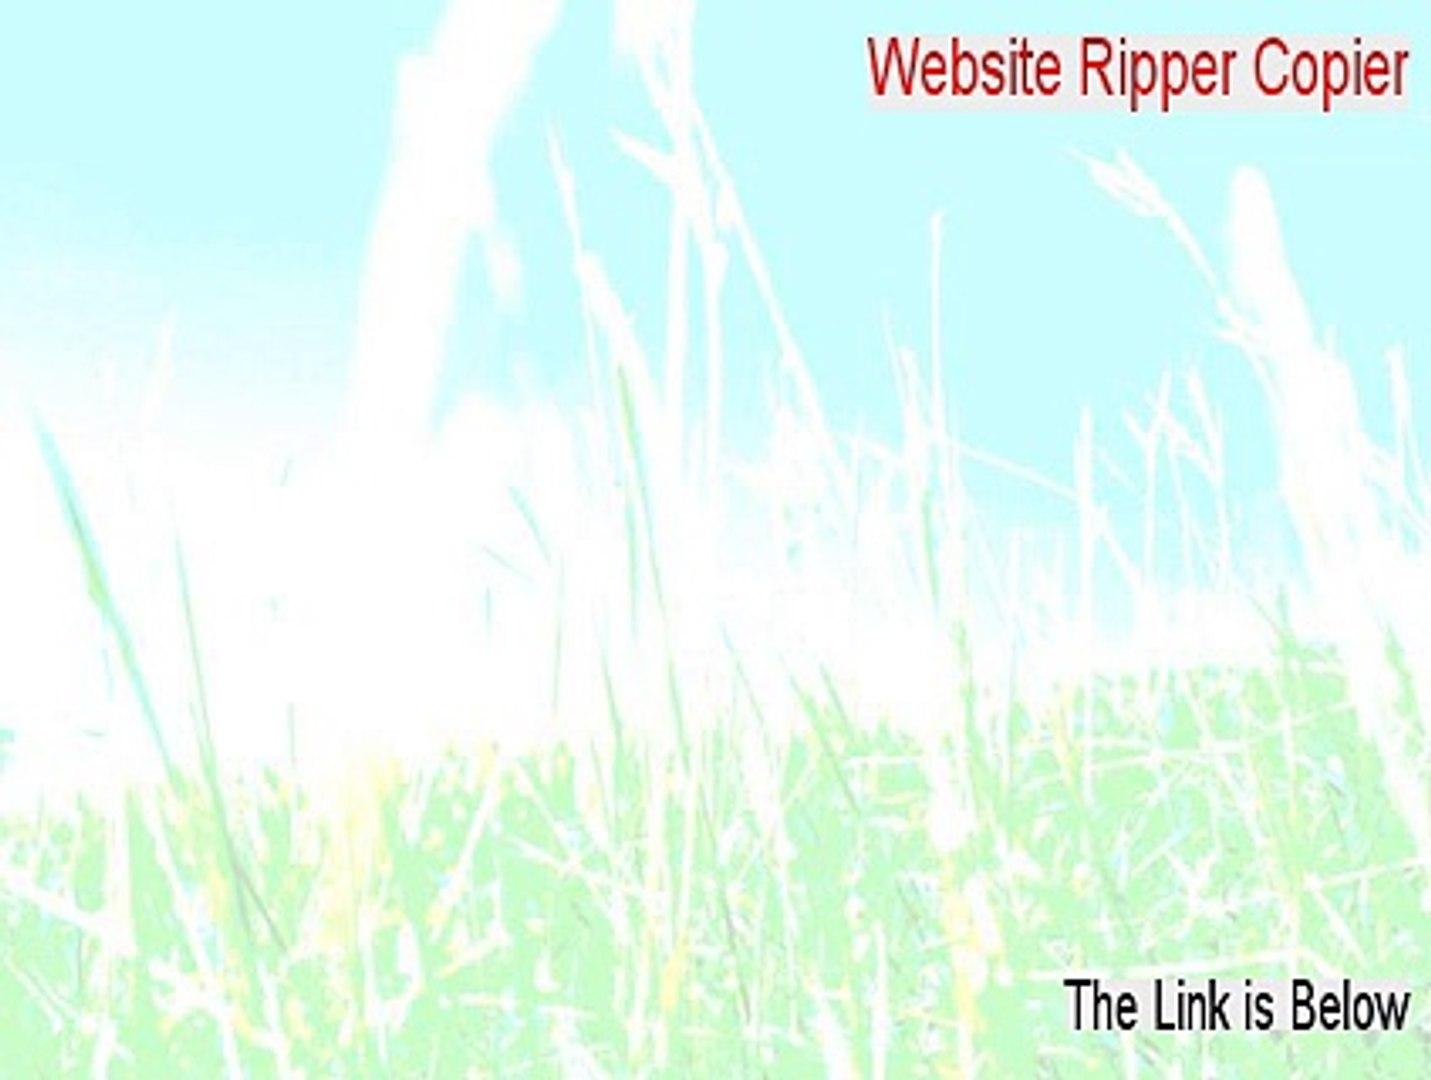 Website Ripper Copier Full Download (Legit Download 2015)